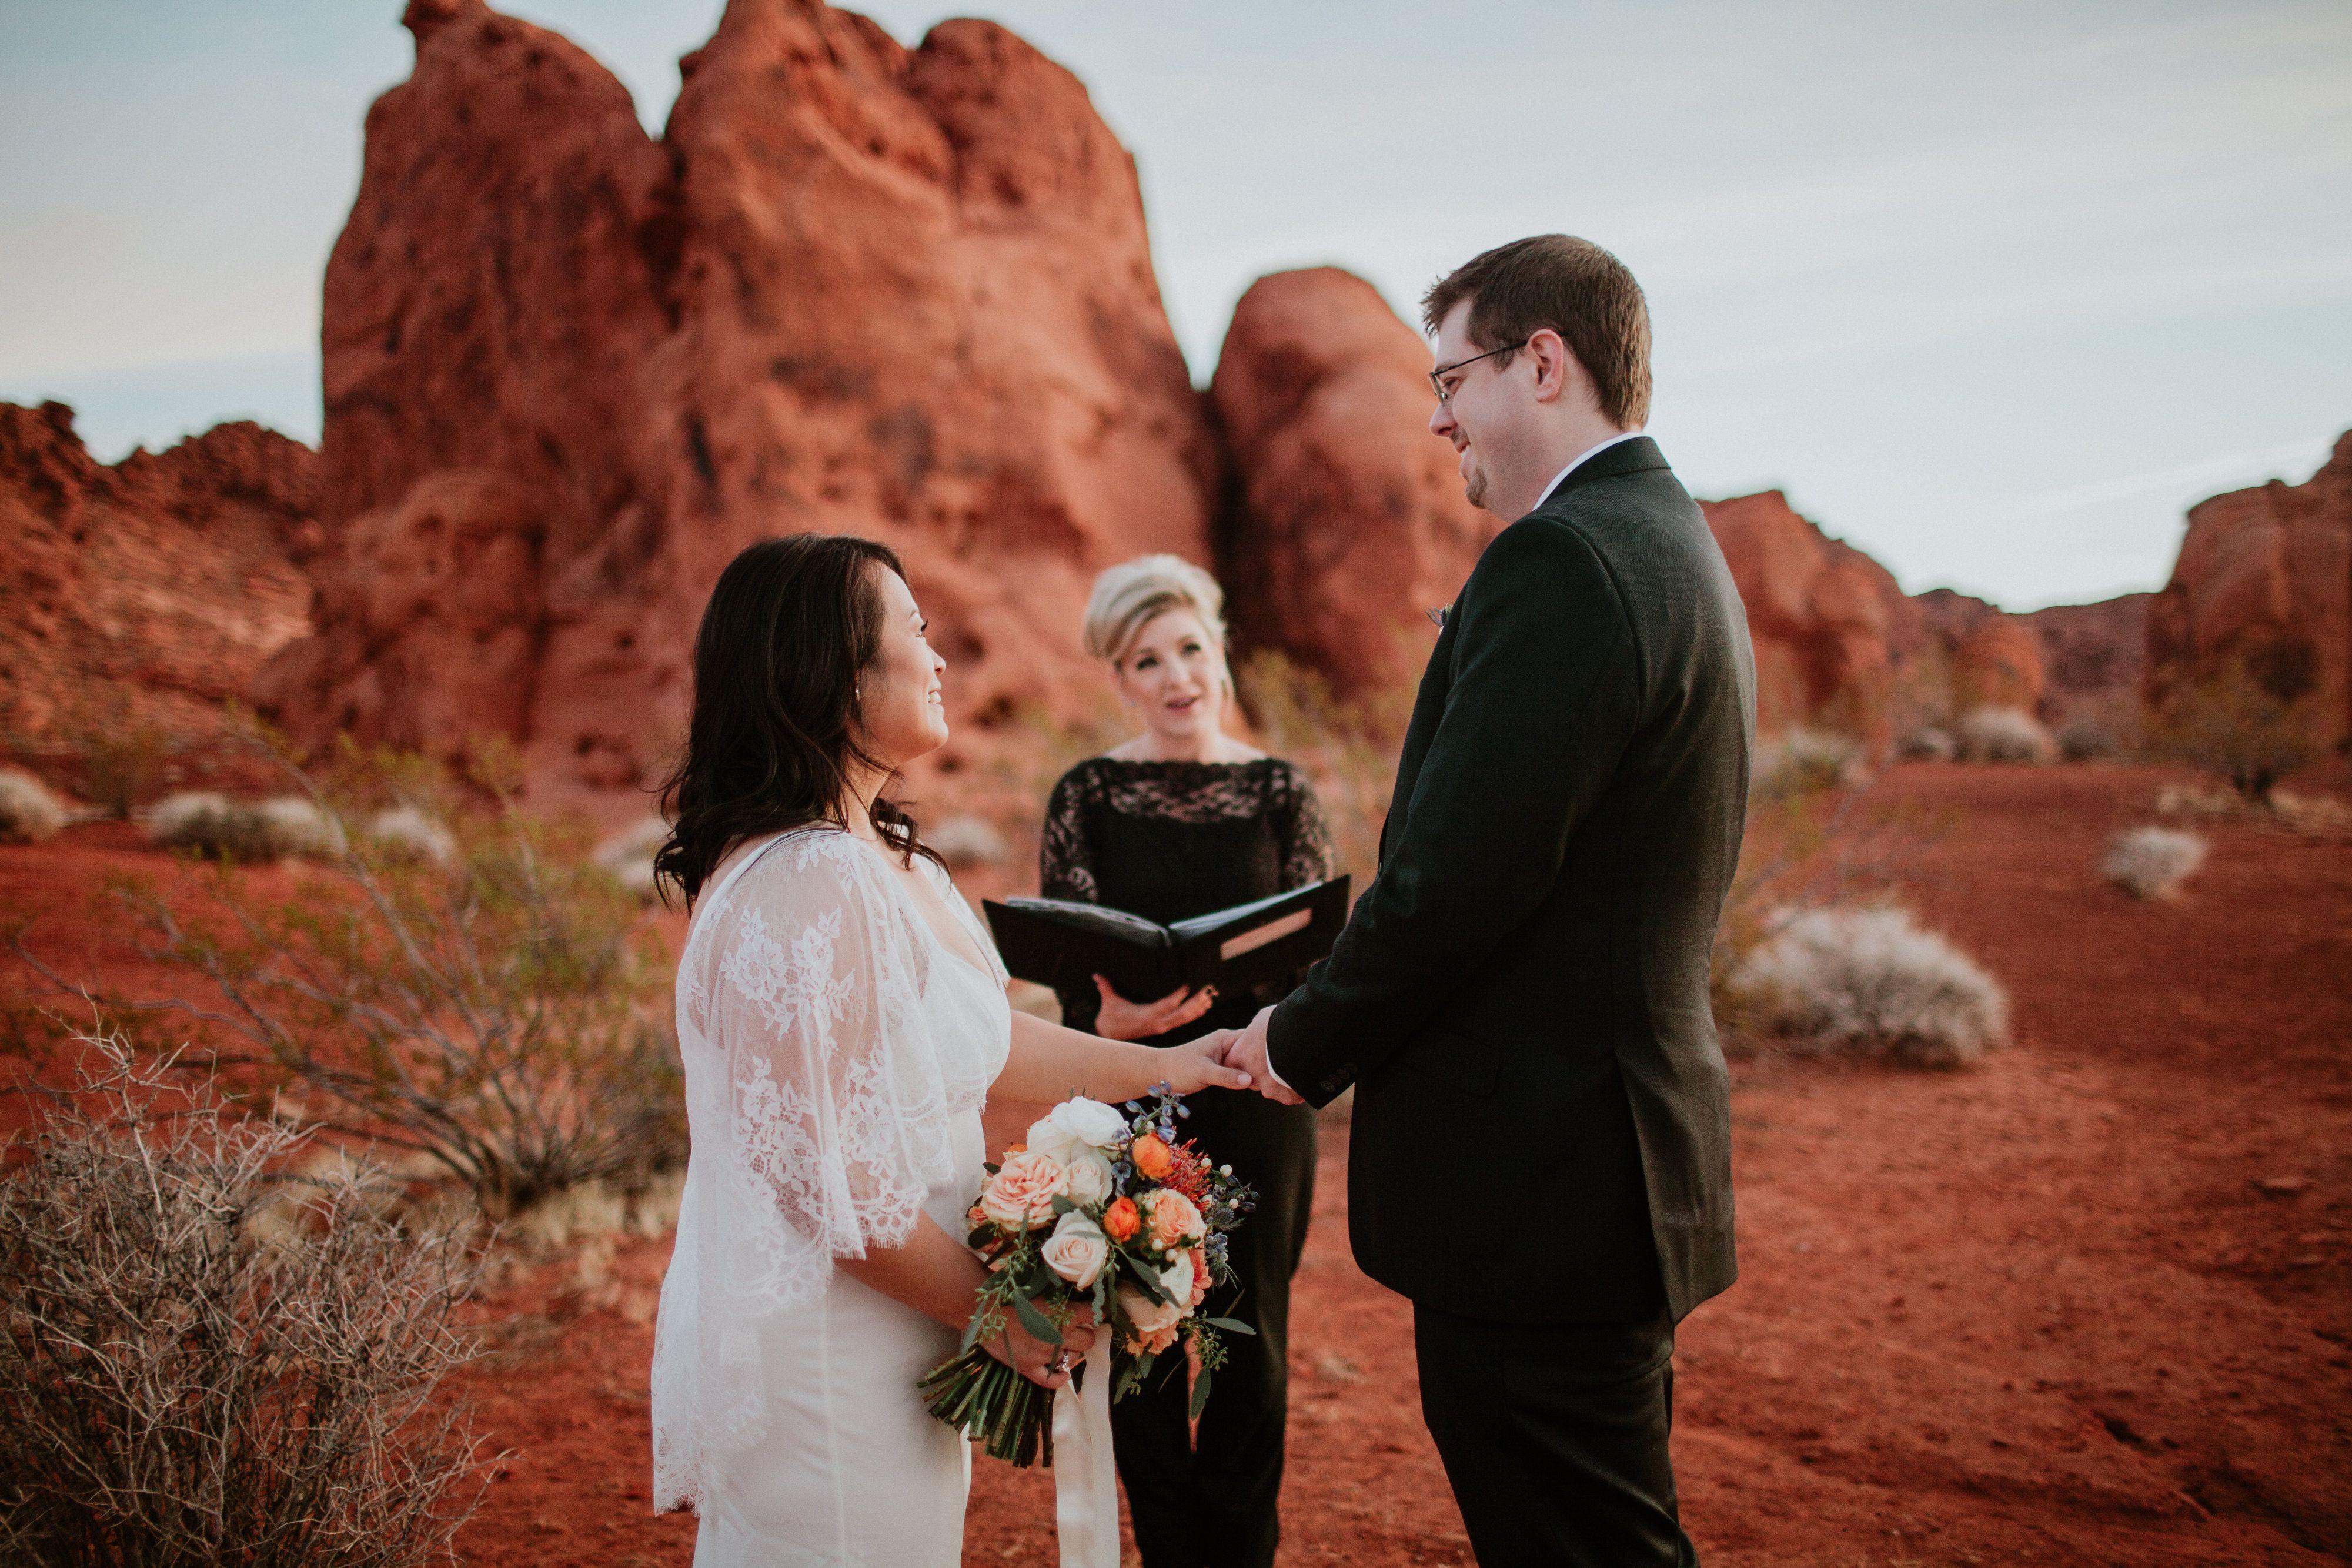 Valley of Fire elopement wedding near Las Vegas photo